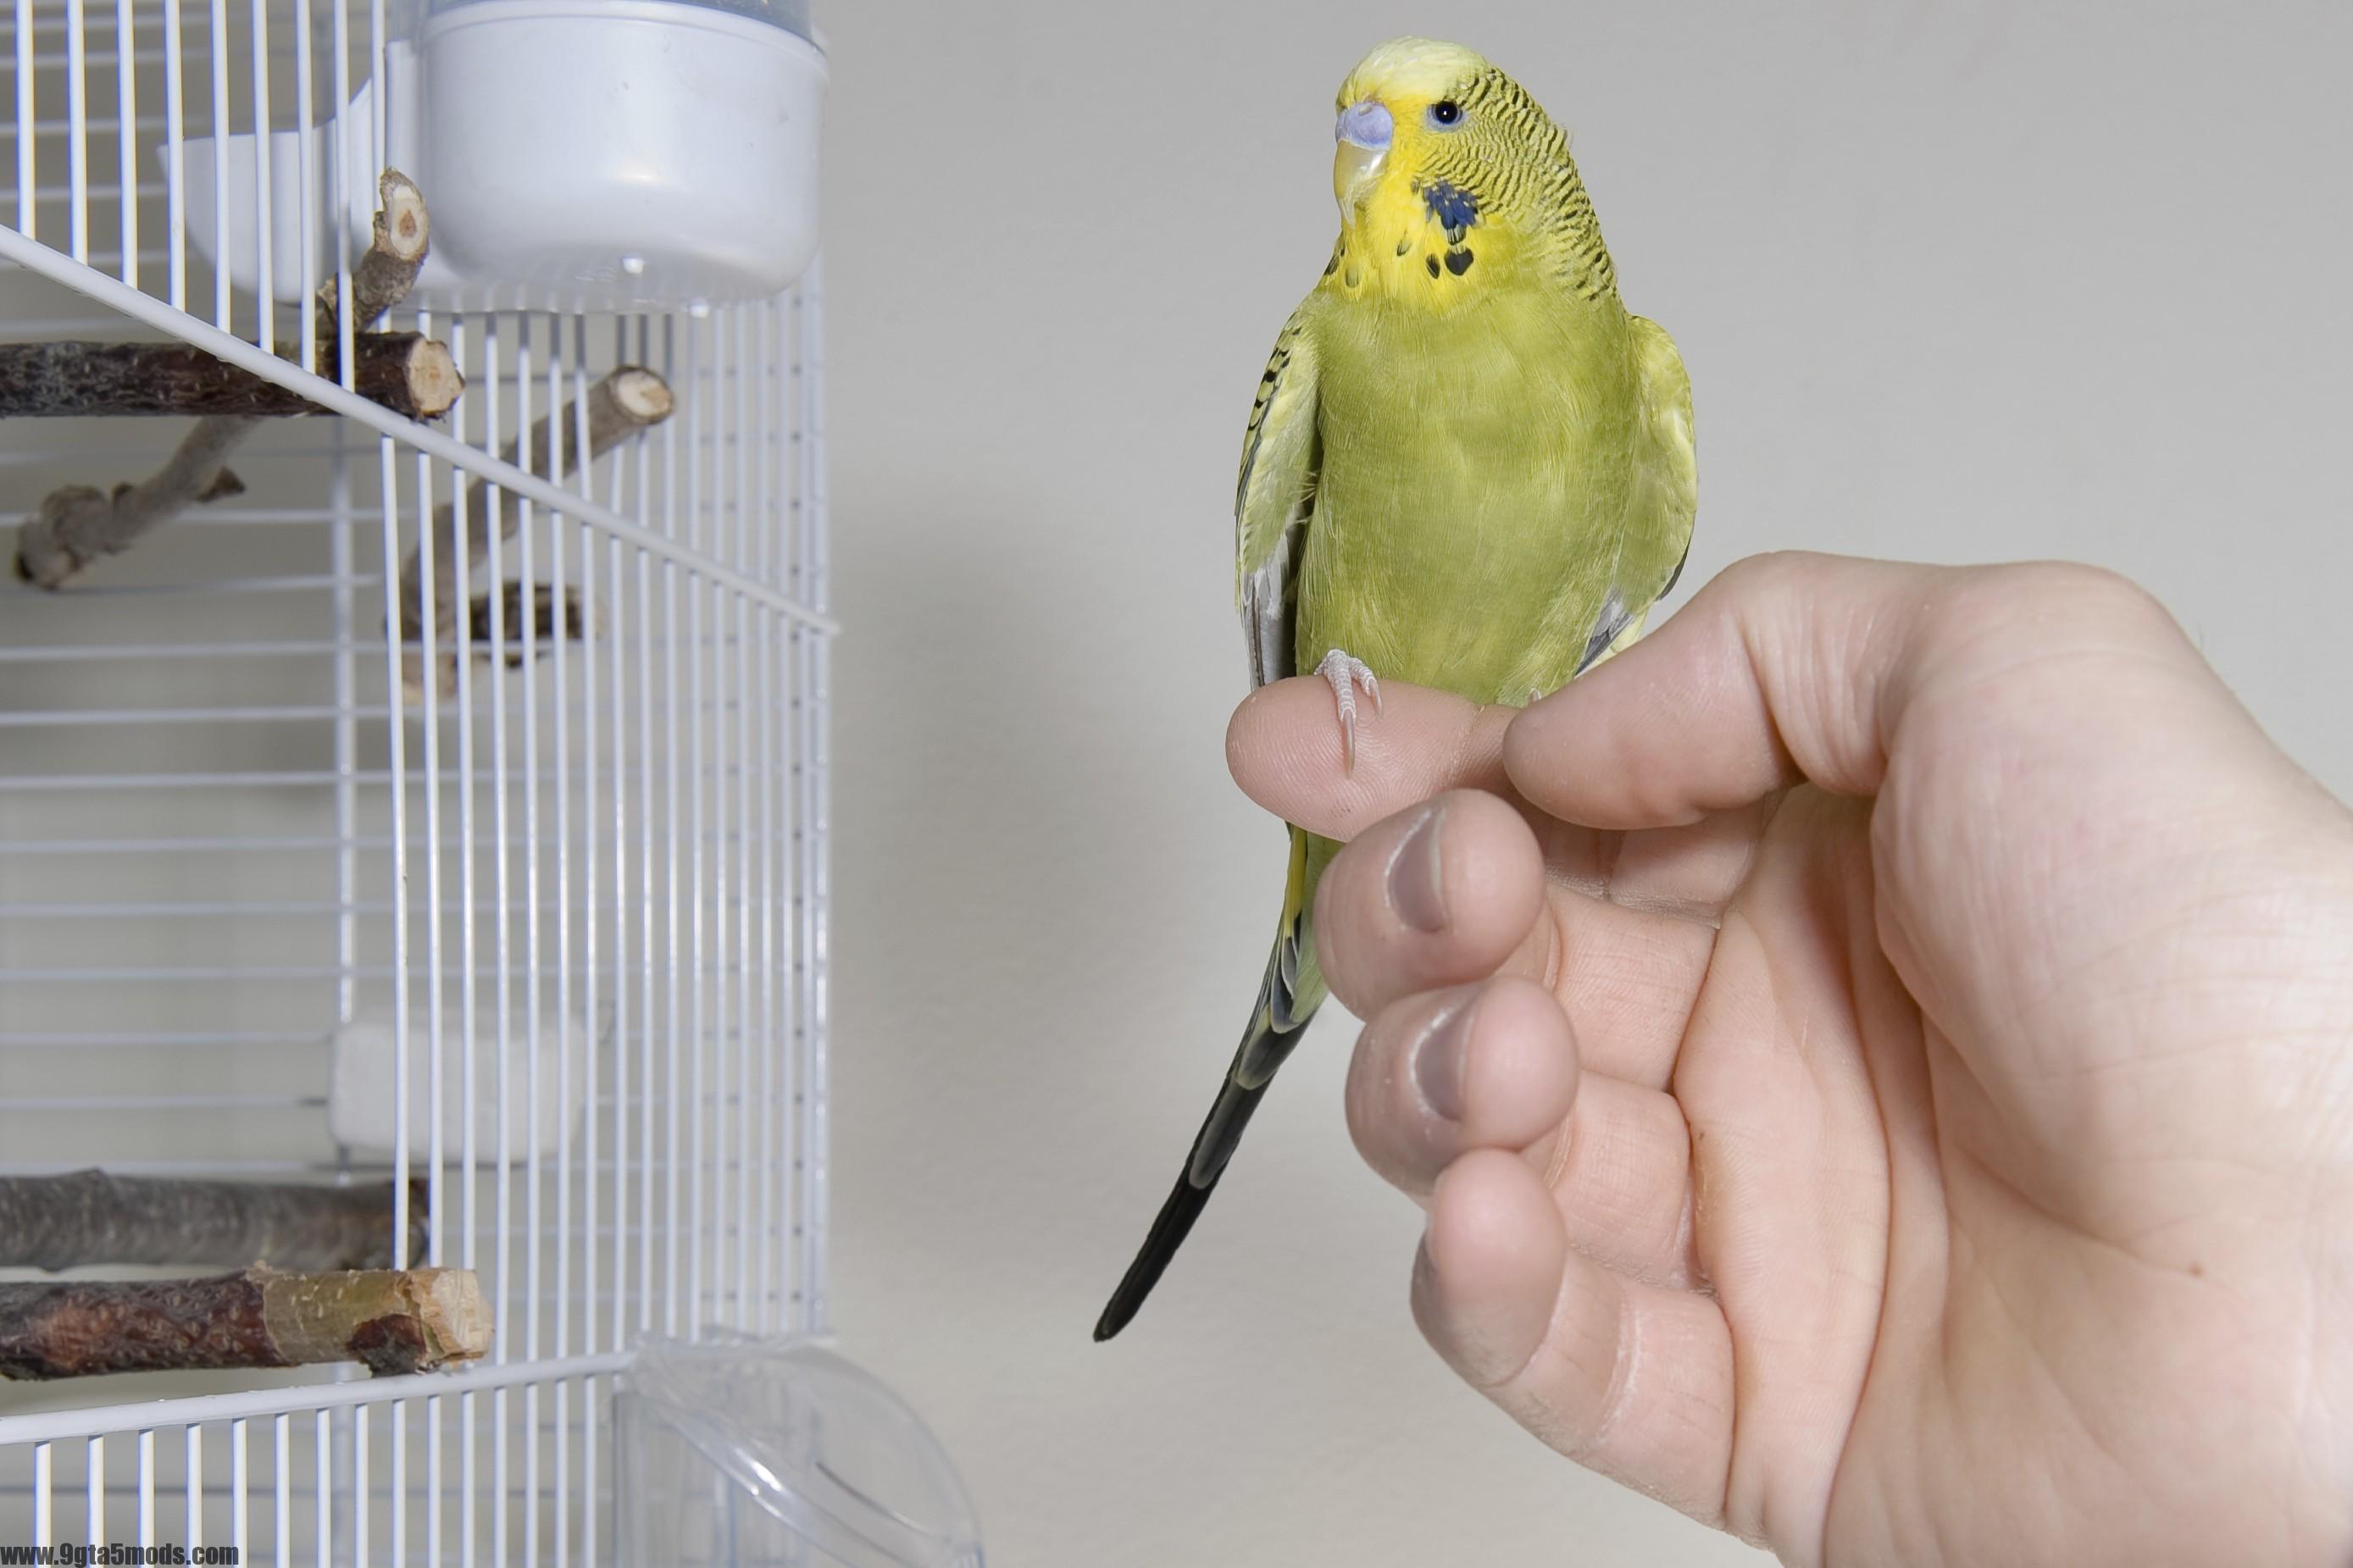 Why Does My Bird Bite? - 9gta5mods.com - photo#48